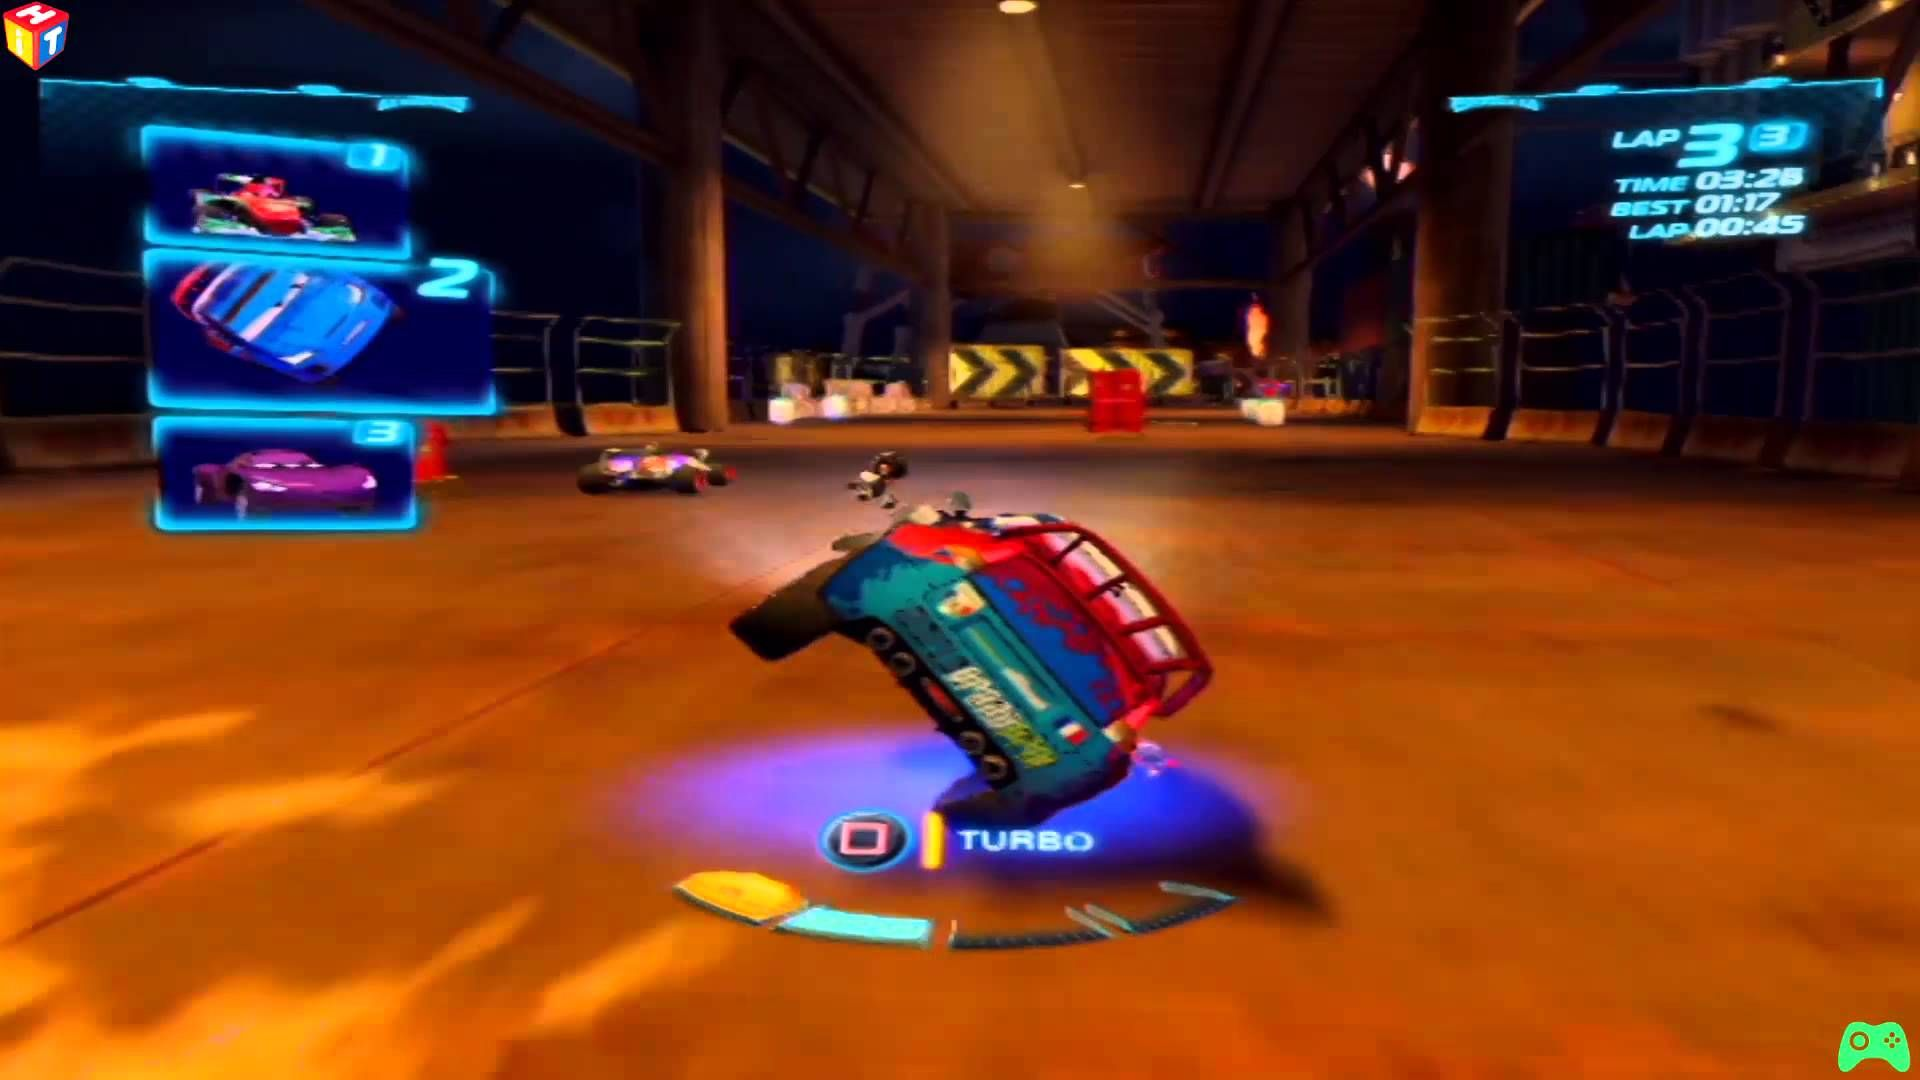 Cars 2 Game - Raoul ÇaRoule - Oil Rig Run - Alive Cars - Battle Race